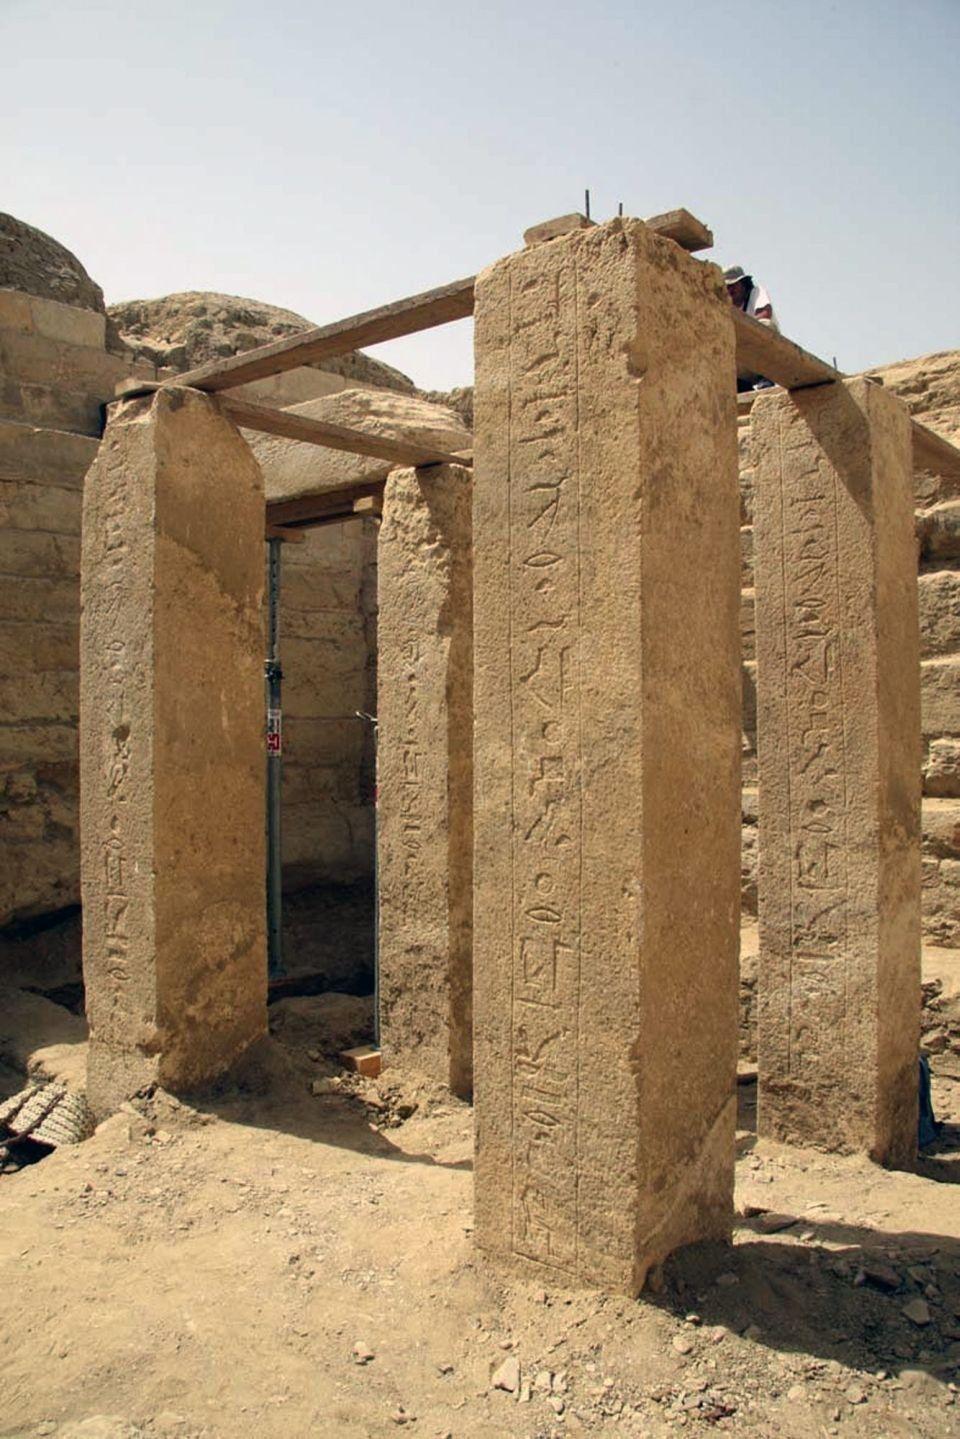 entrance to princess Shert Nebti's tomb discovered in Abu Sir (NW of Saqqara)